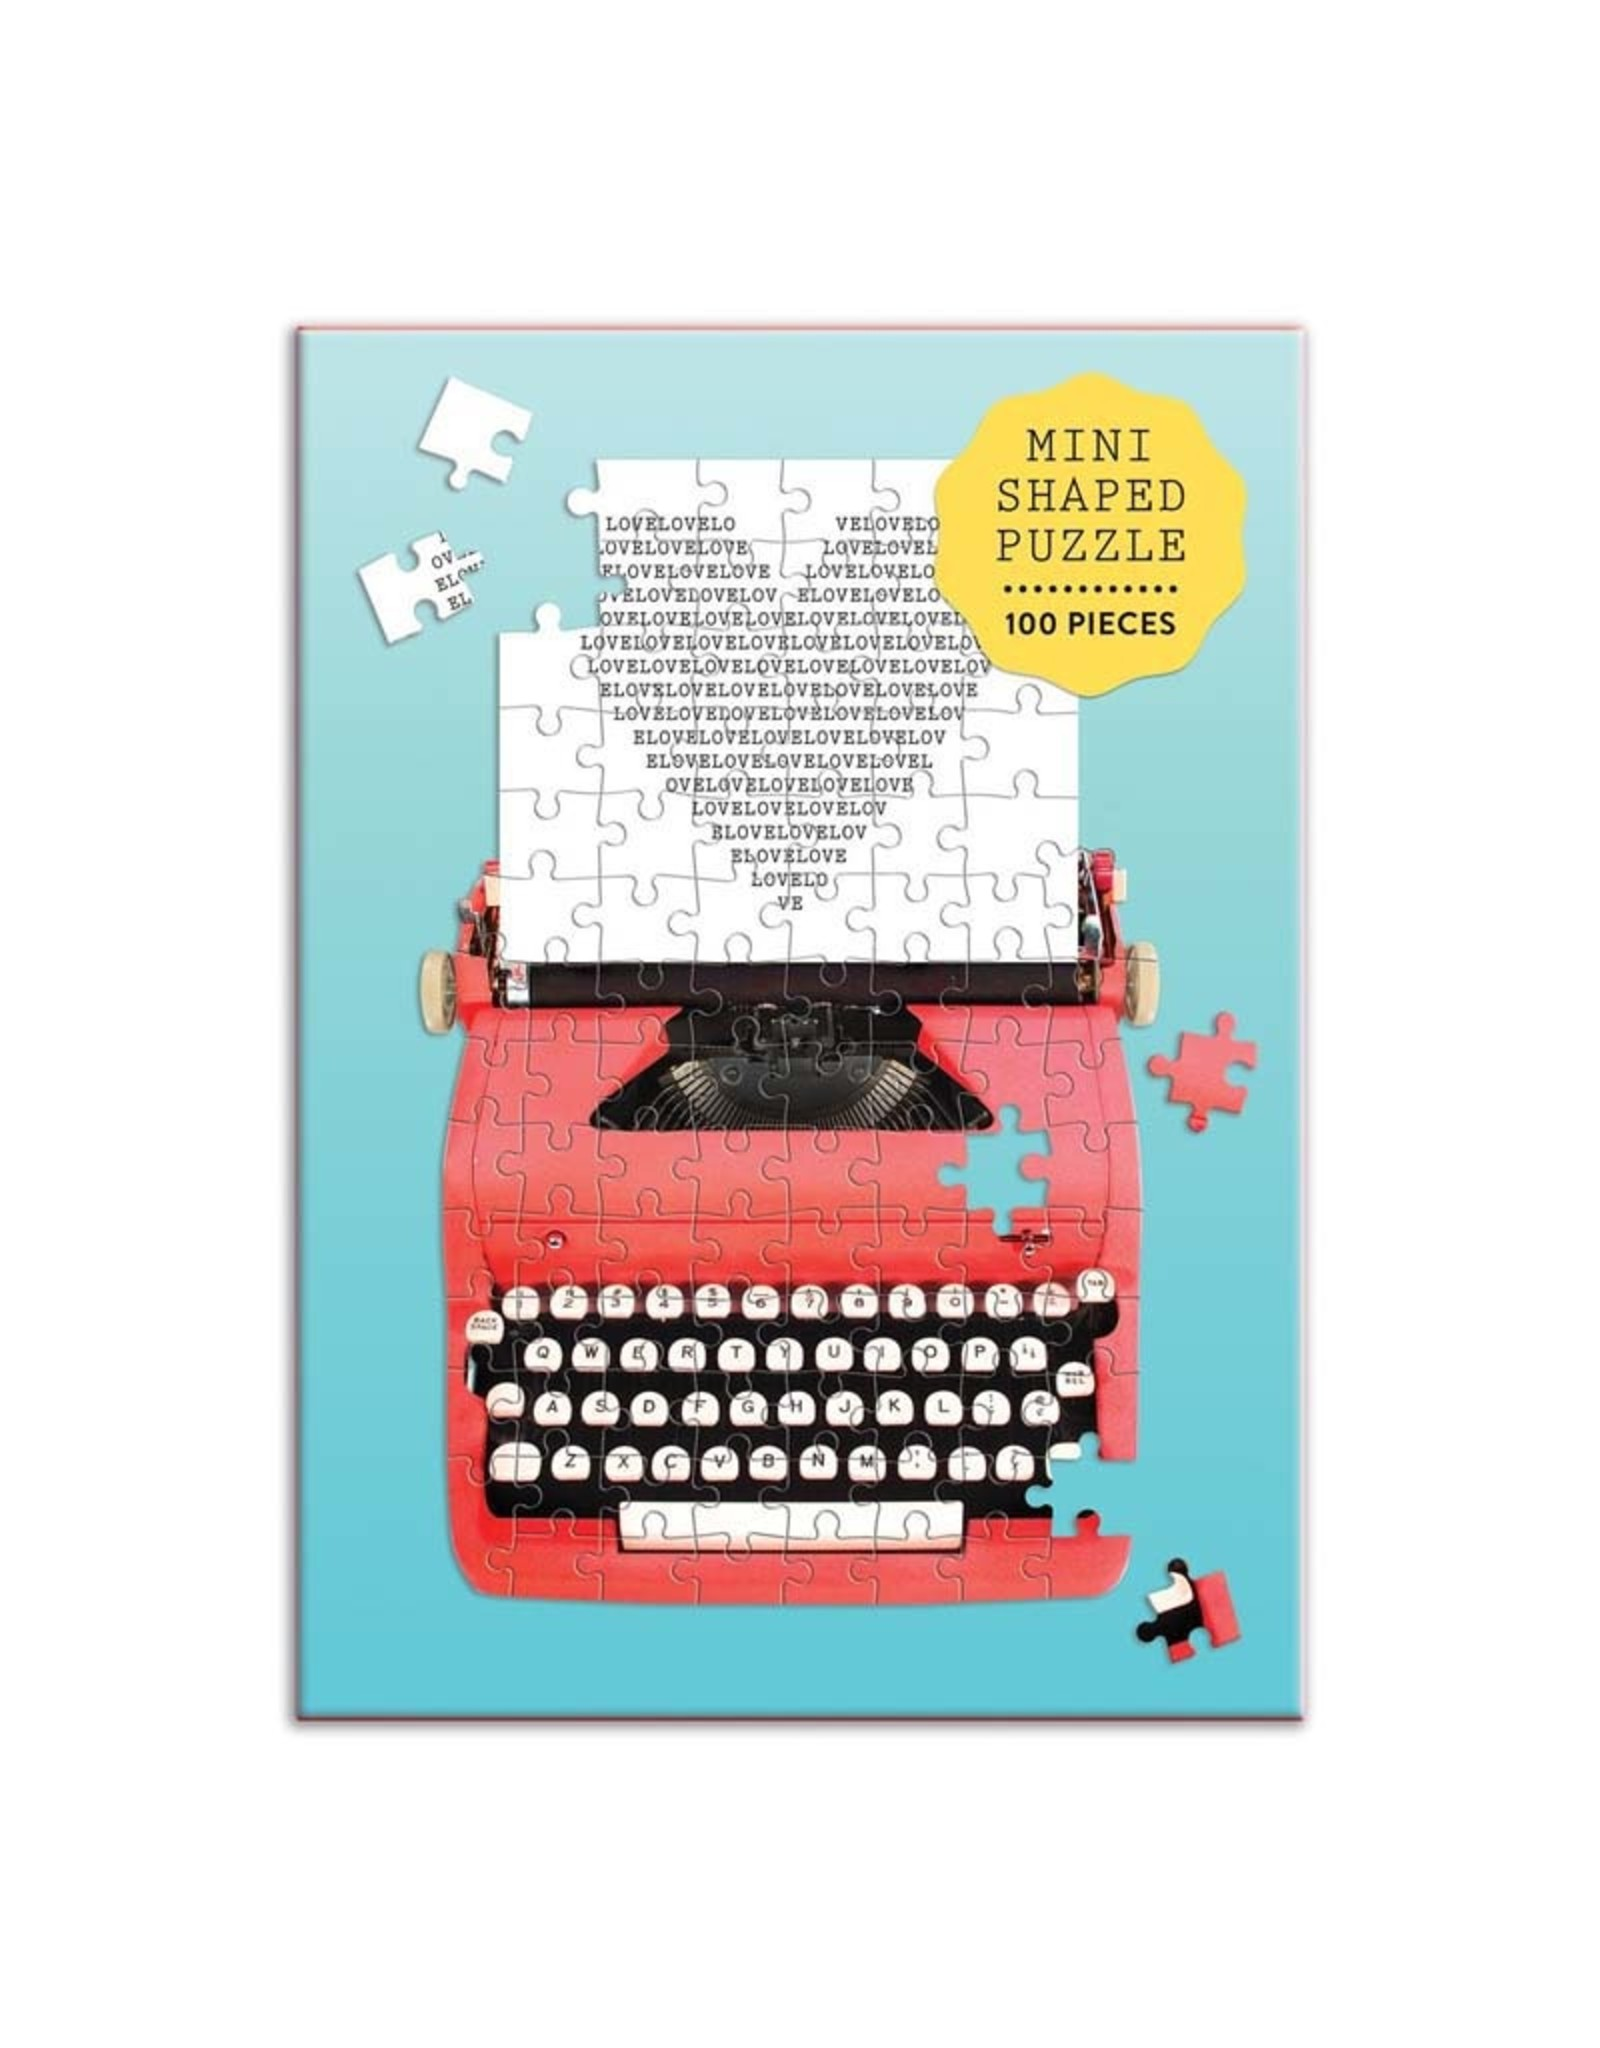 100pc Puzzle Shaped Mini Vintage Typewriter